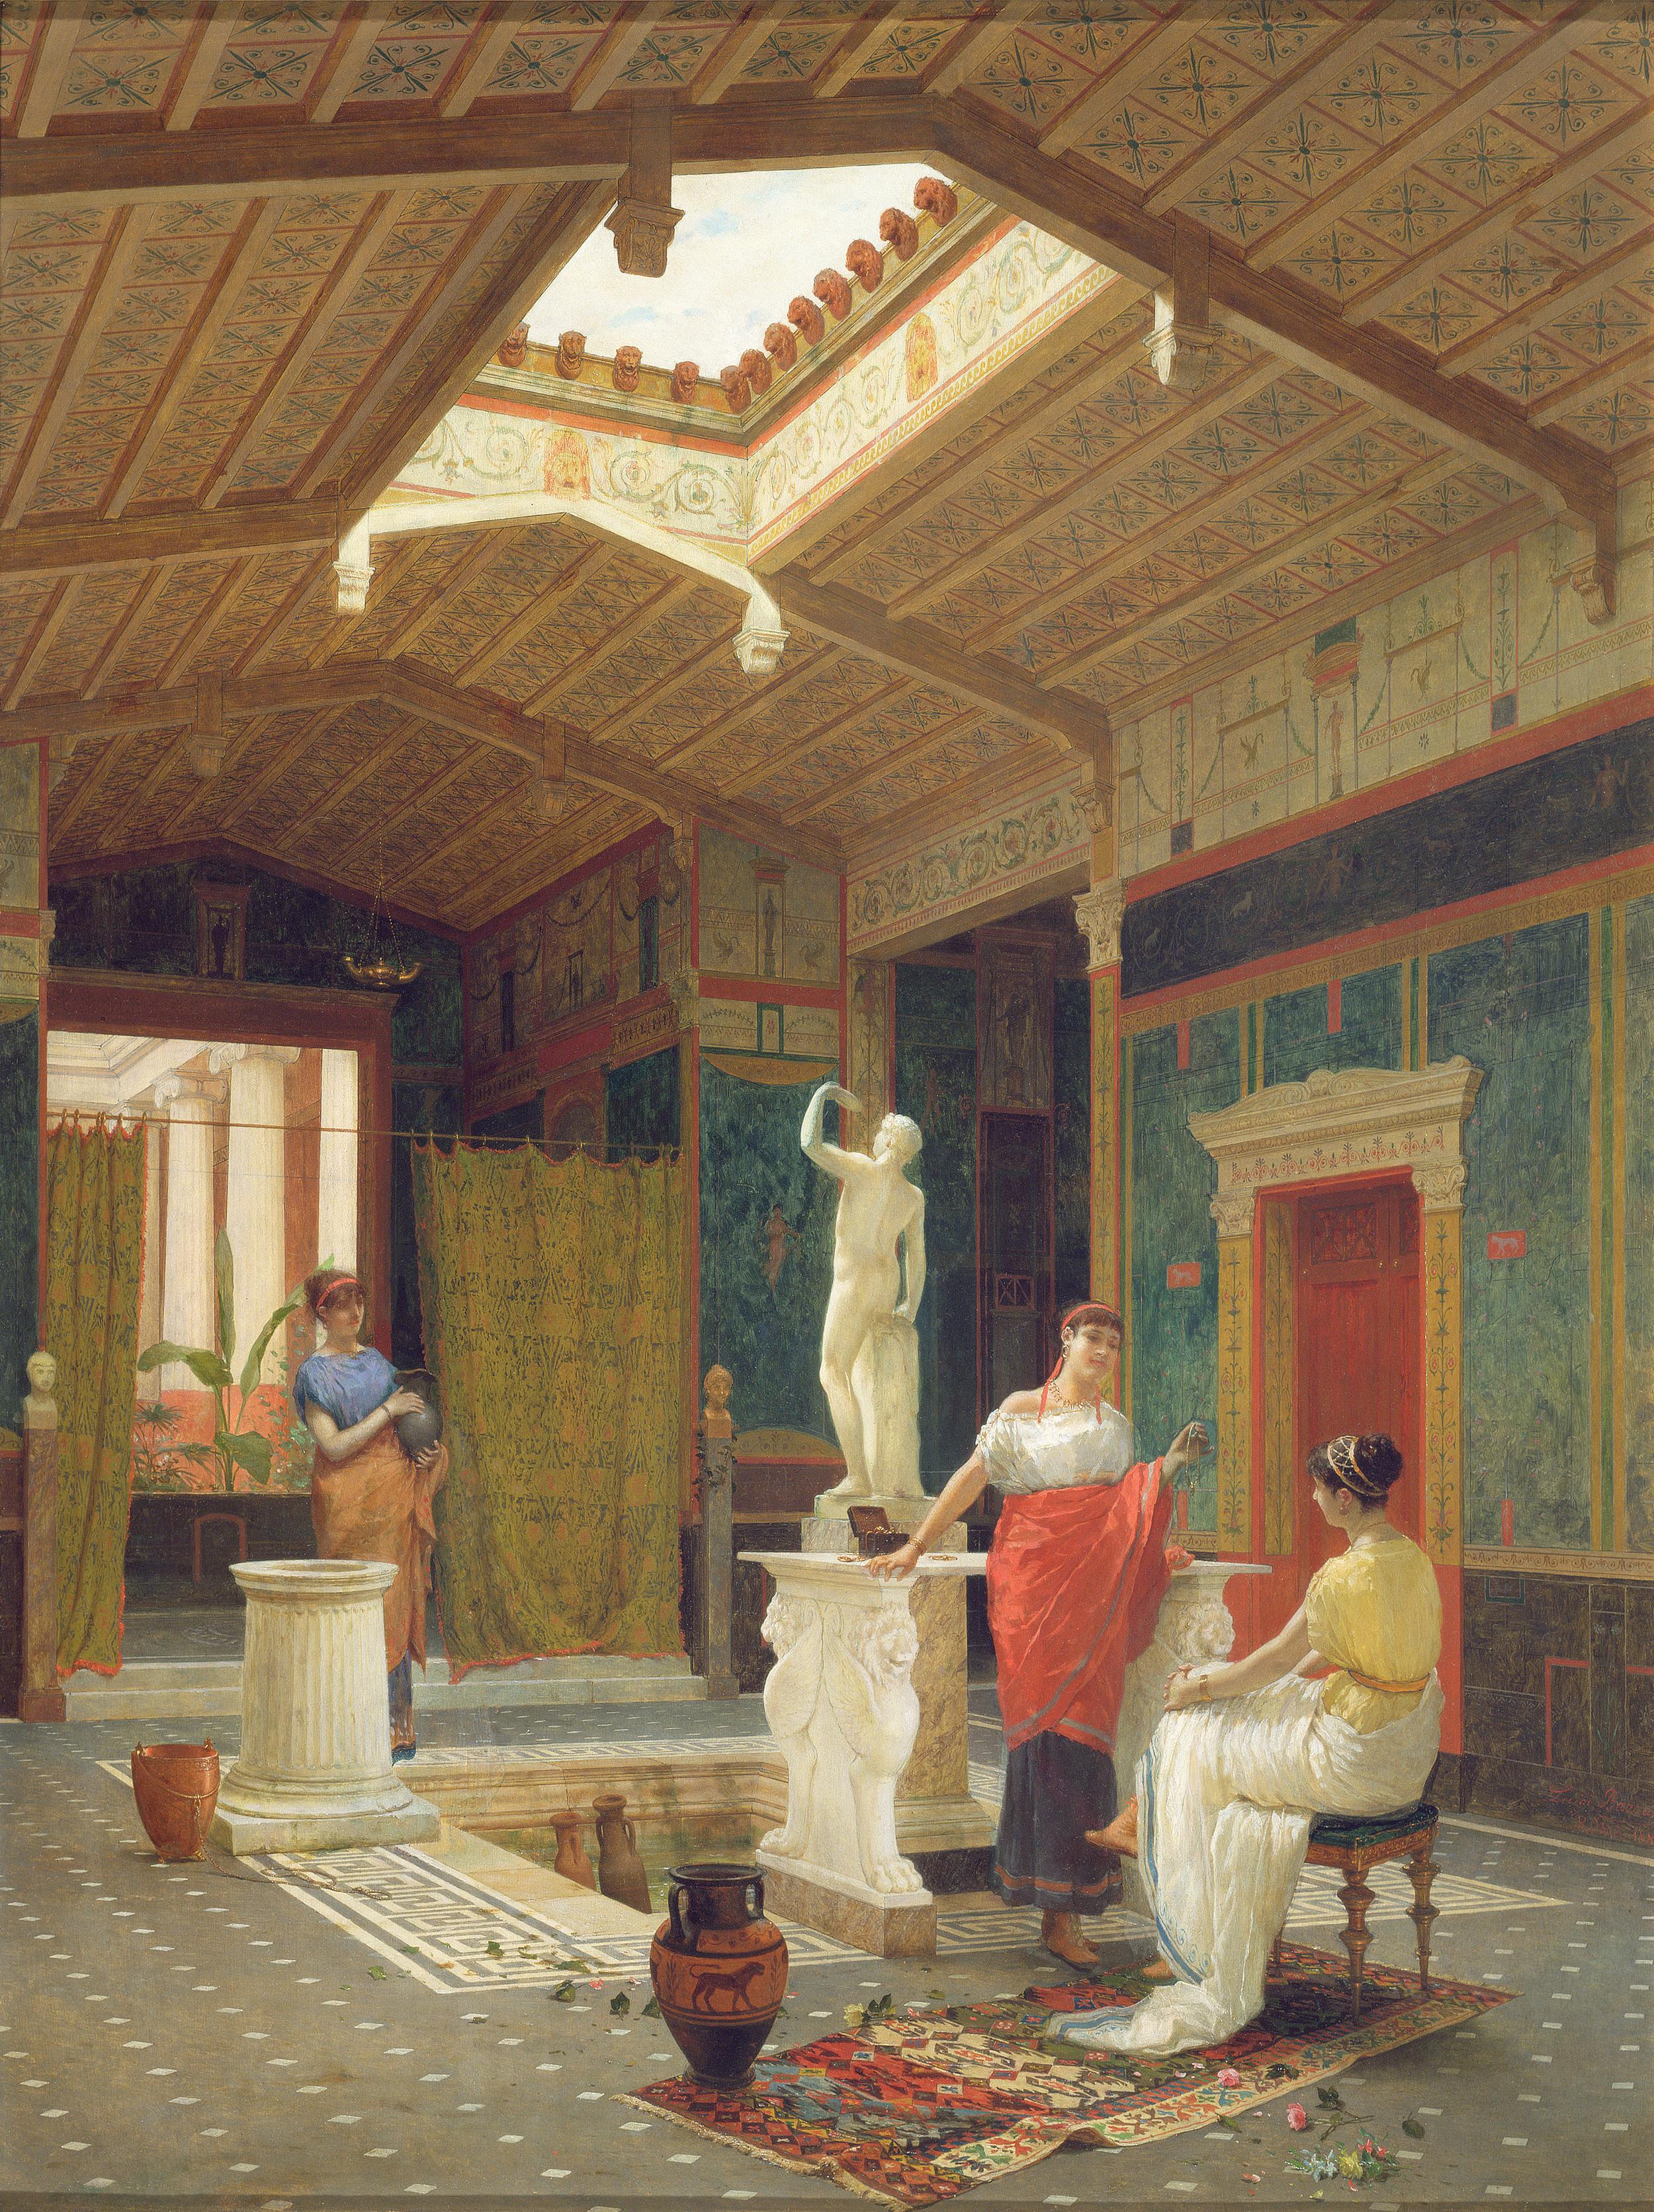 A Pompeian Interior by Luigi Bazzani. ©.Dahesh Museum of Art, 1996.24. Used with permission.